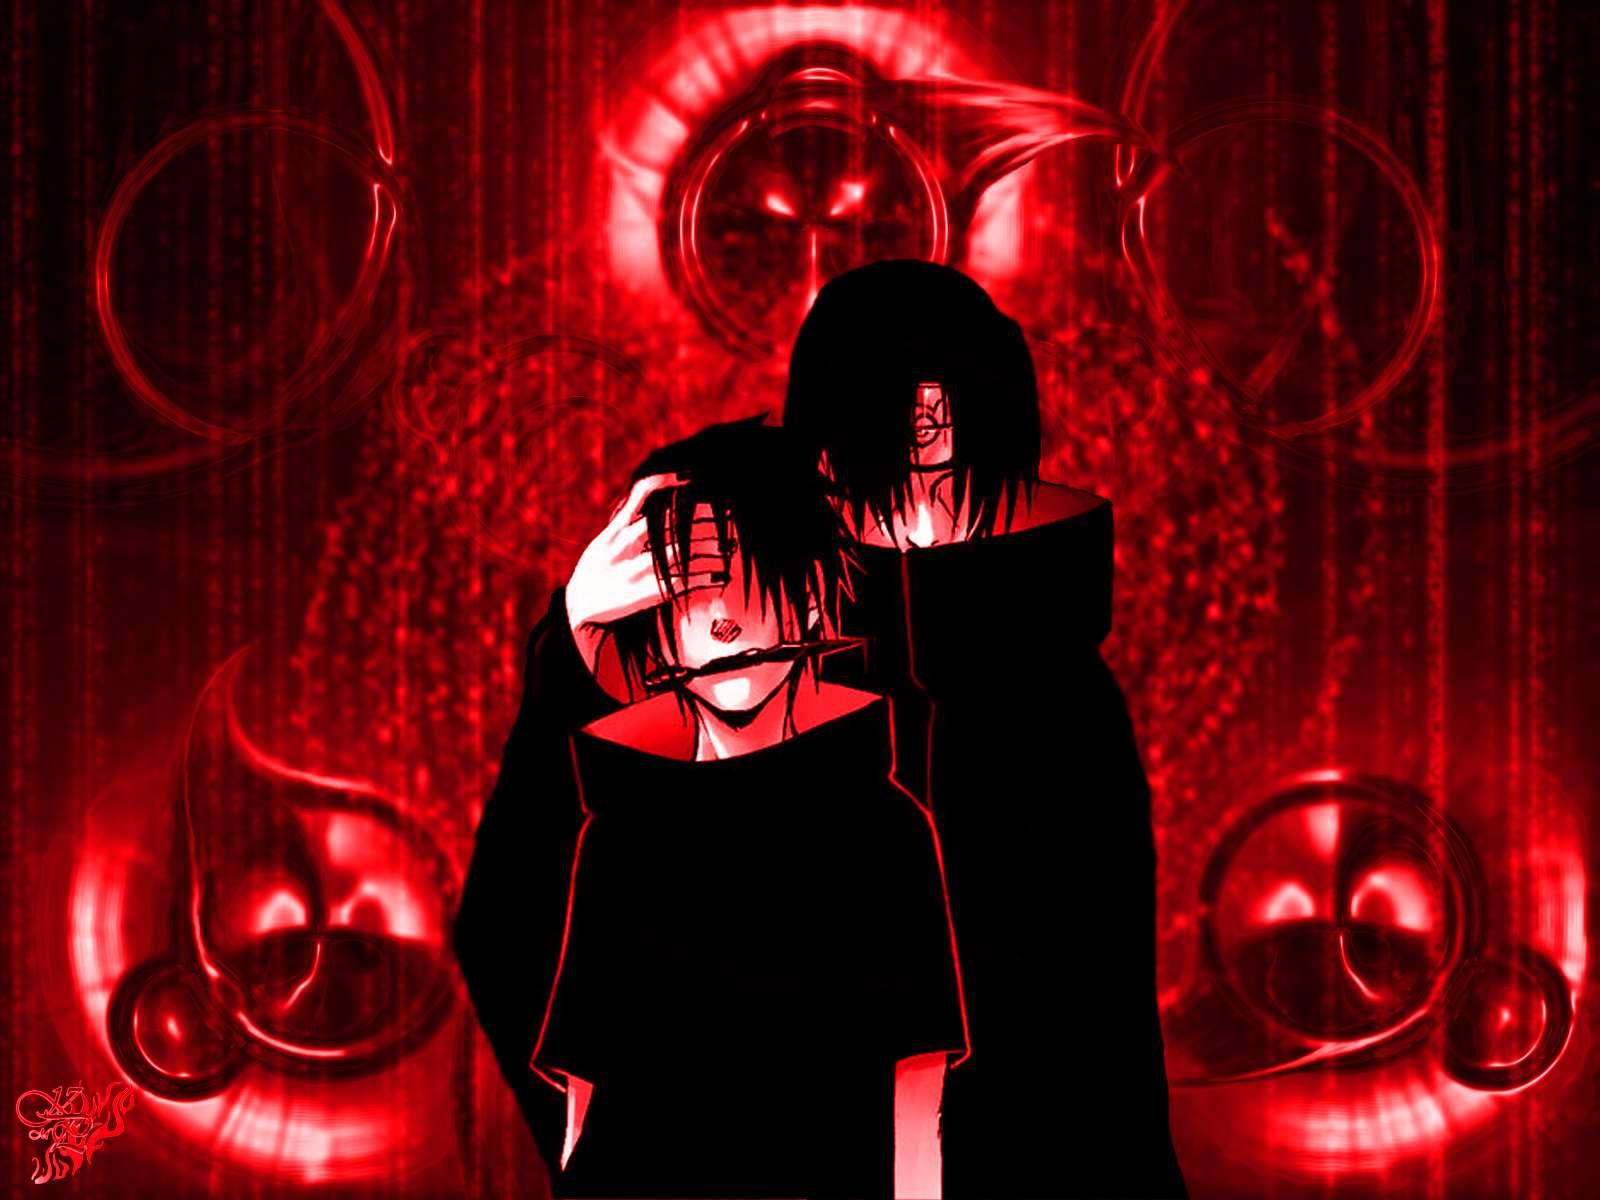 Anime Naruto Wallpaper 10